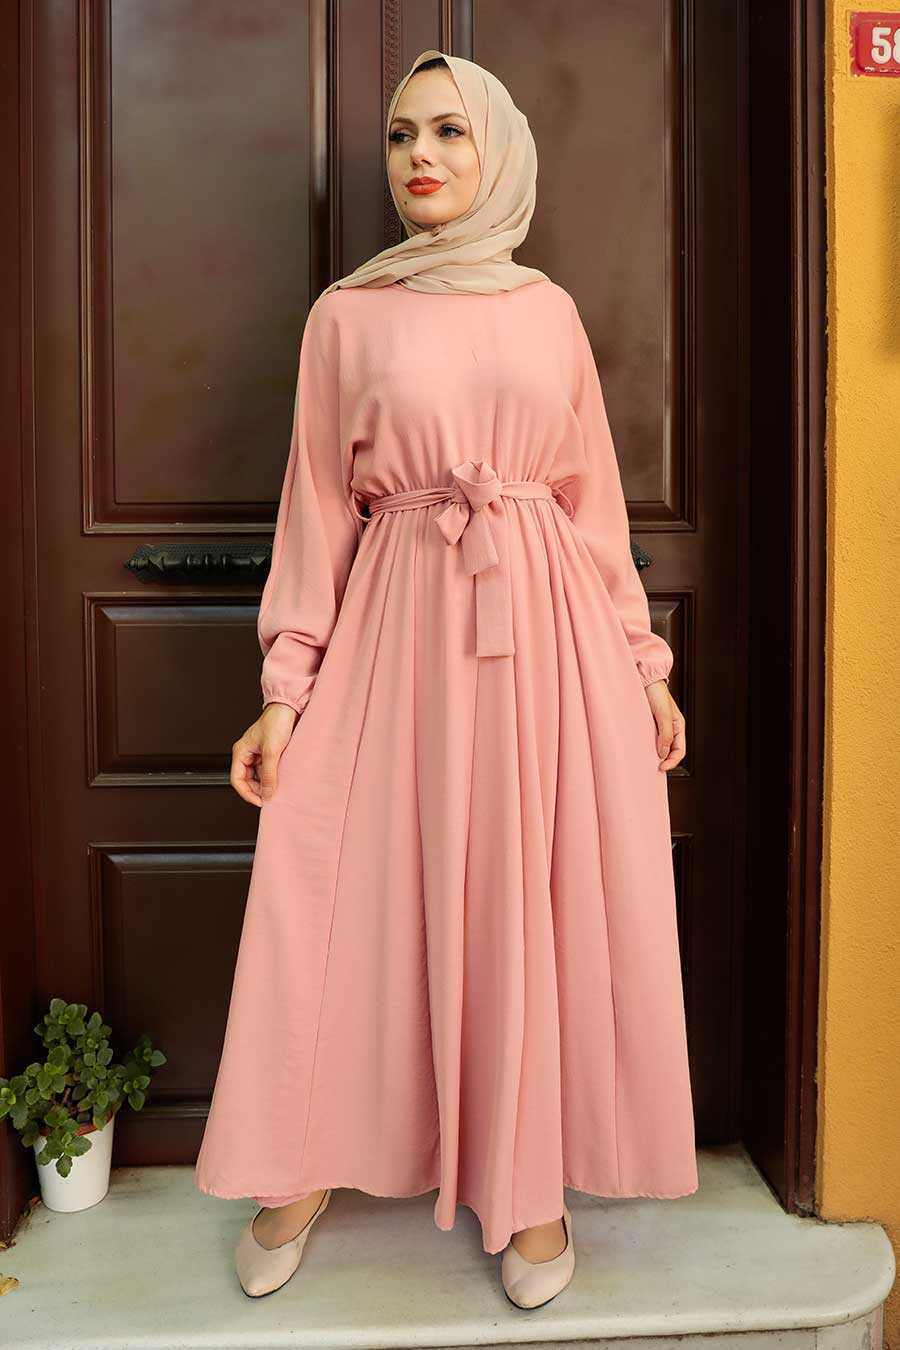 Salmon Pink Hijab Dress 76150SMN